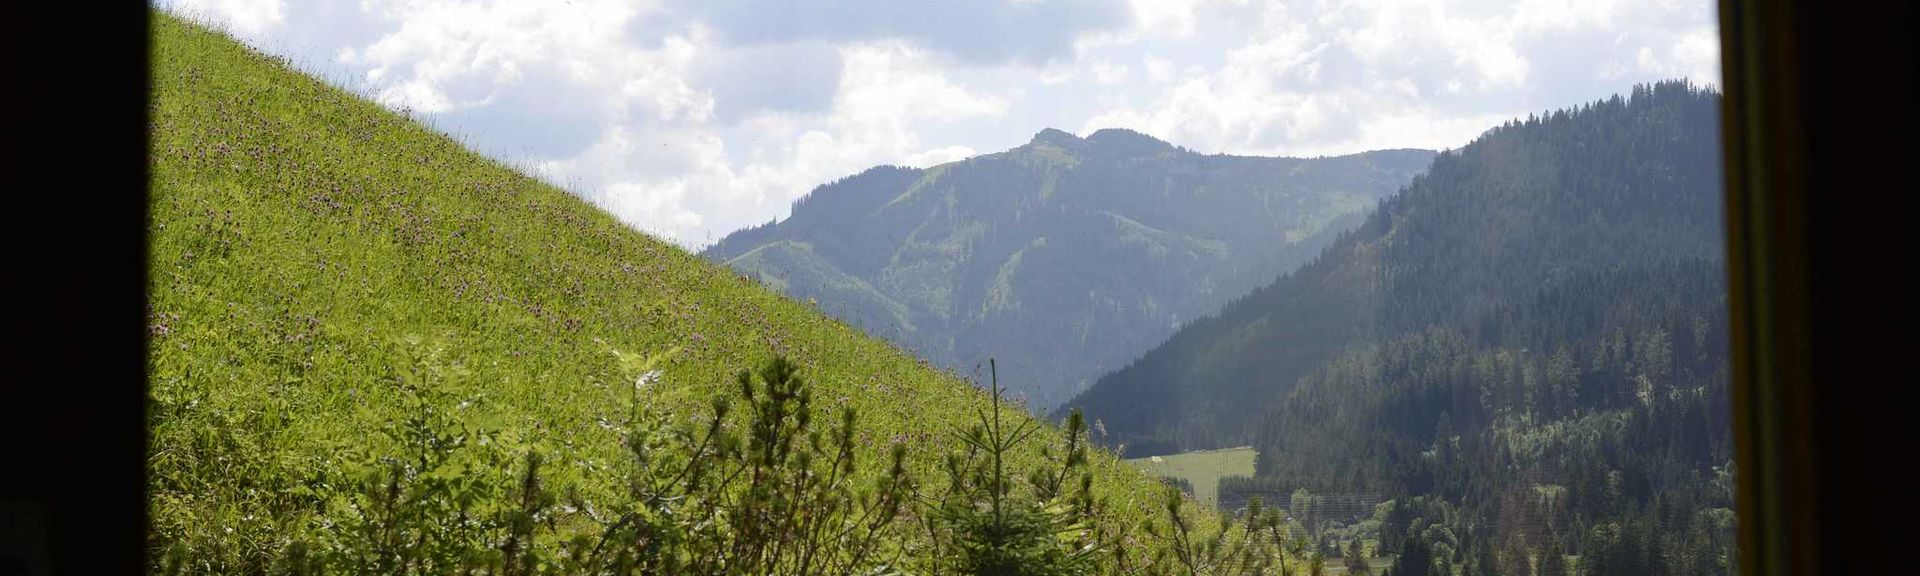 Tannheim, Tirolo, Austria